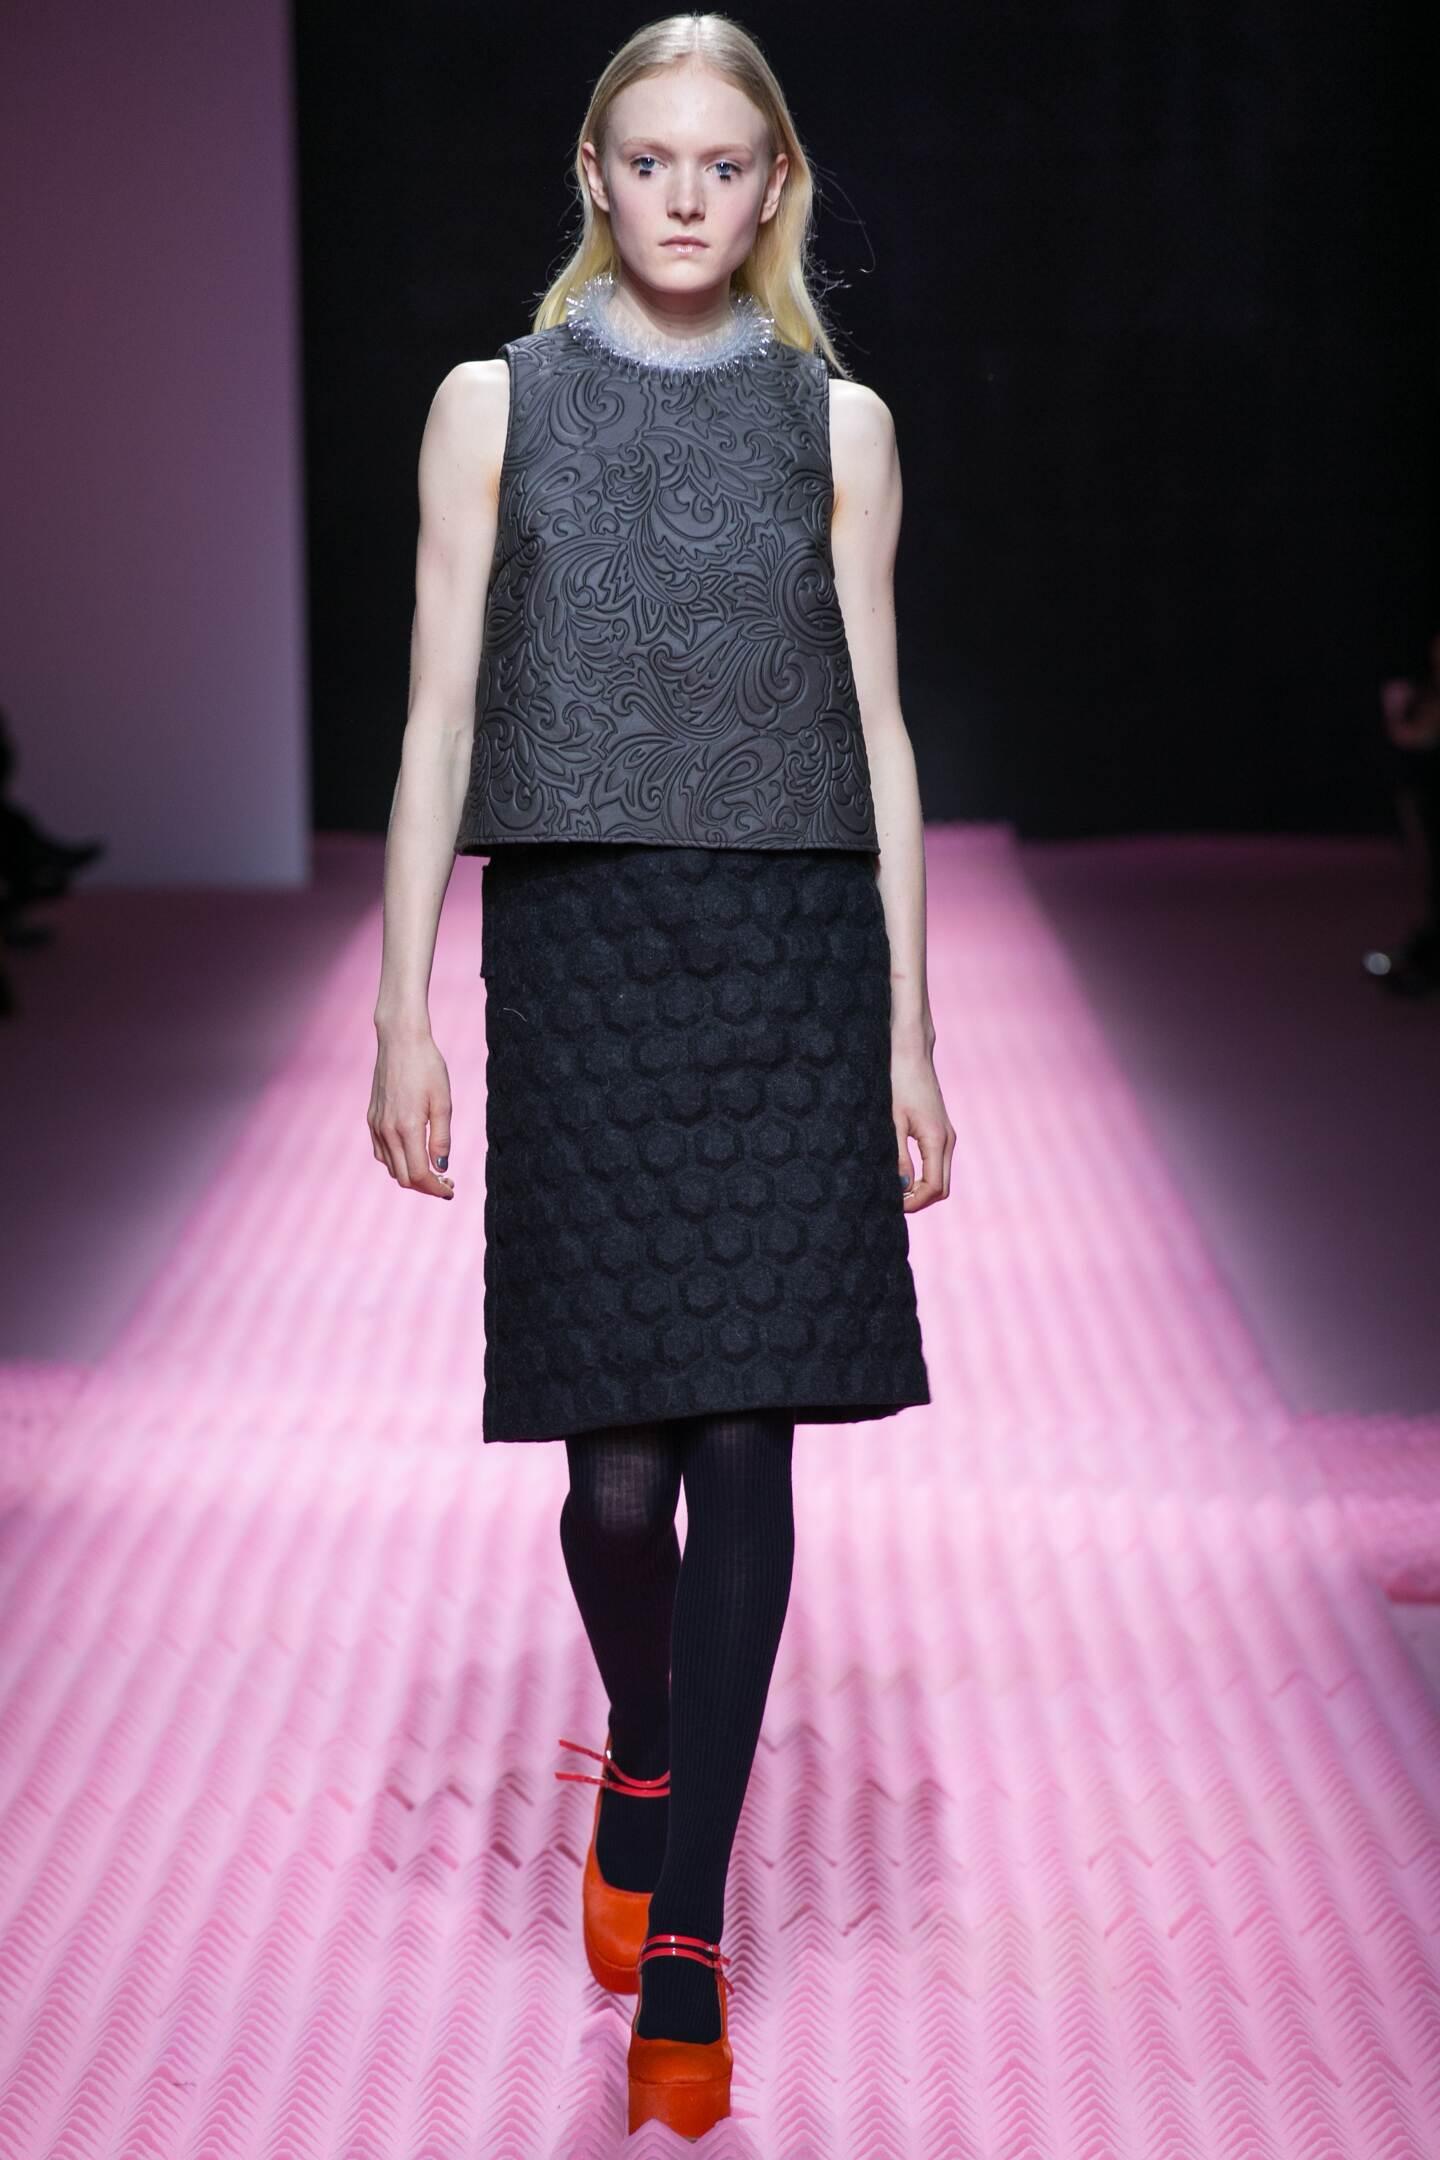 Catwalk Mary Katrantzou Fall Winter 2015 16 Women's Collection London Fashion Week